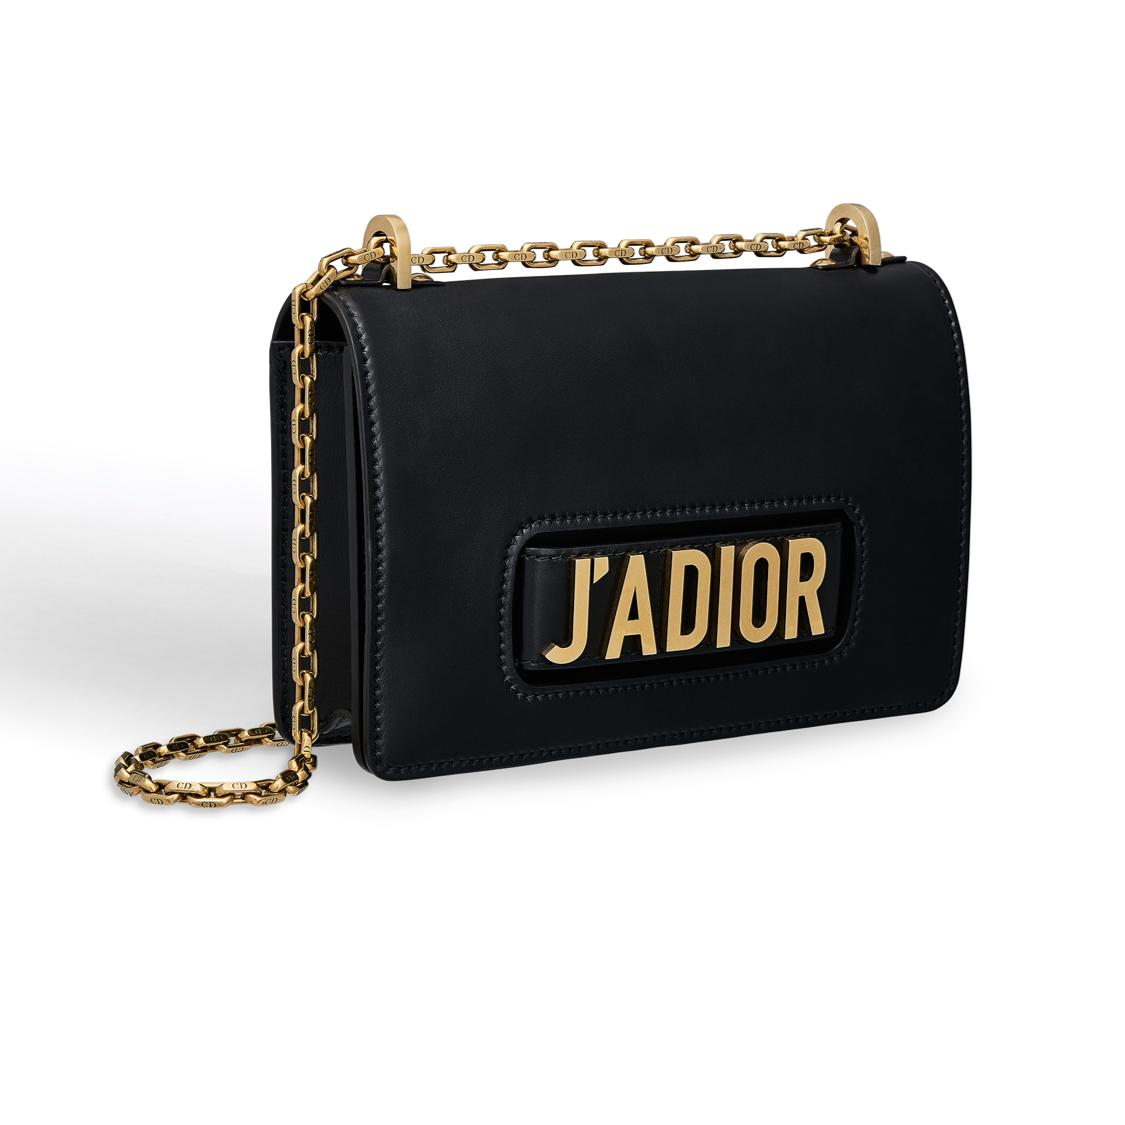 Dior J'adior bag side